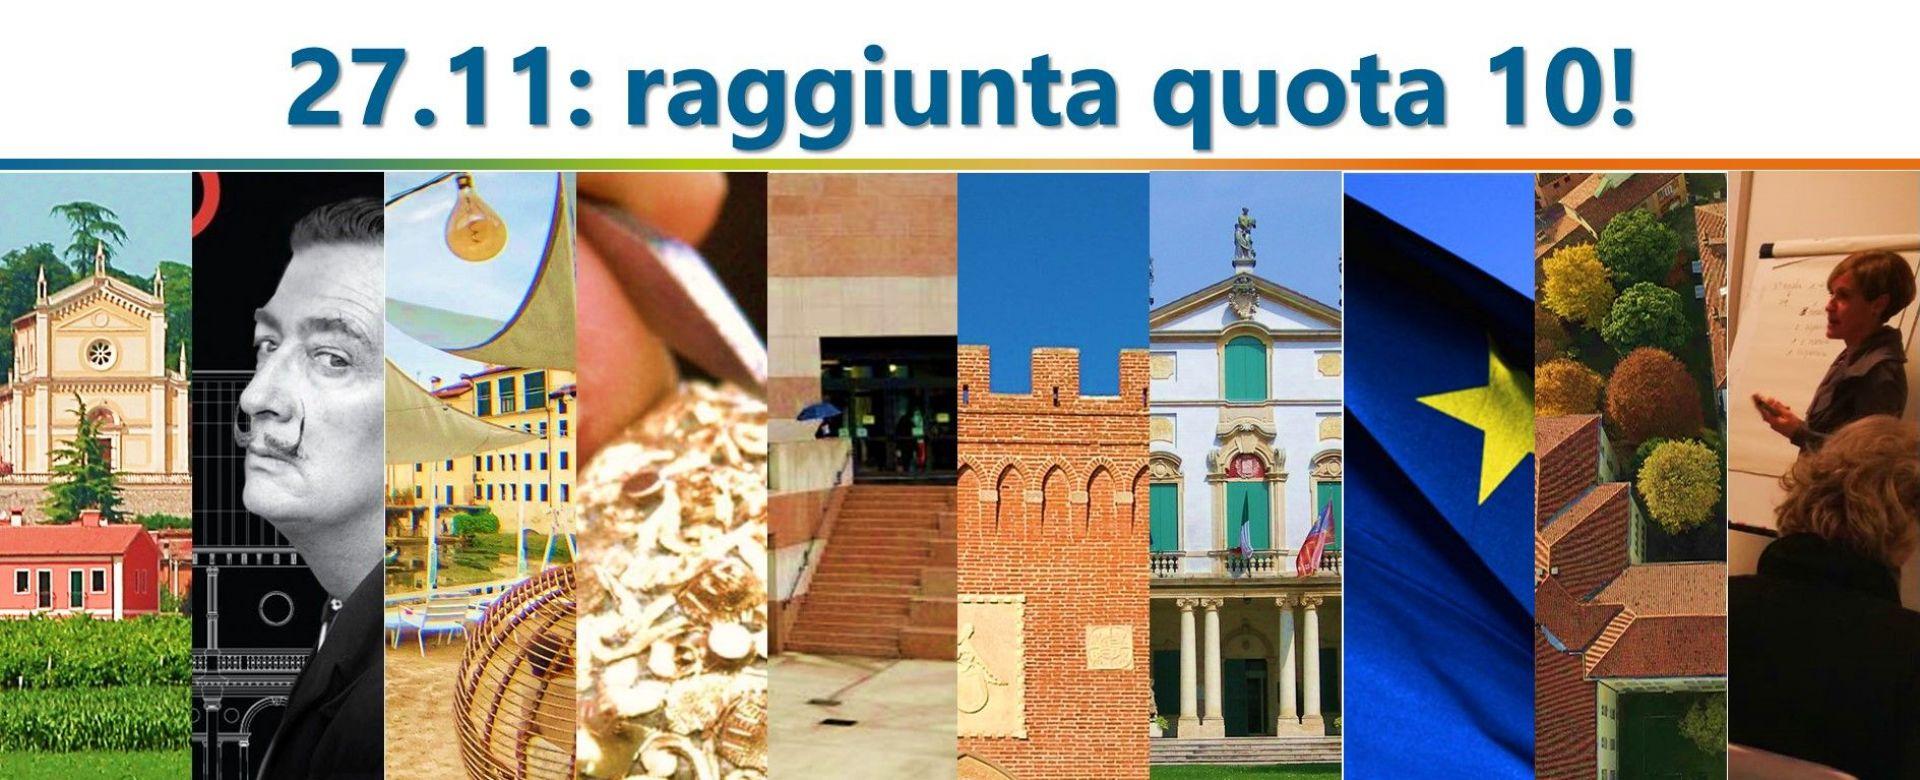 27.11.2019 - Raggiunta quota 10